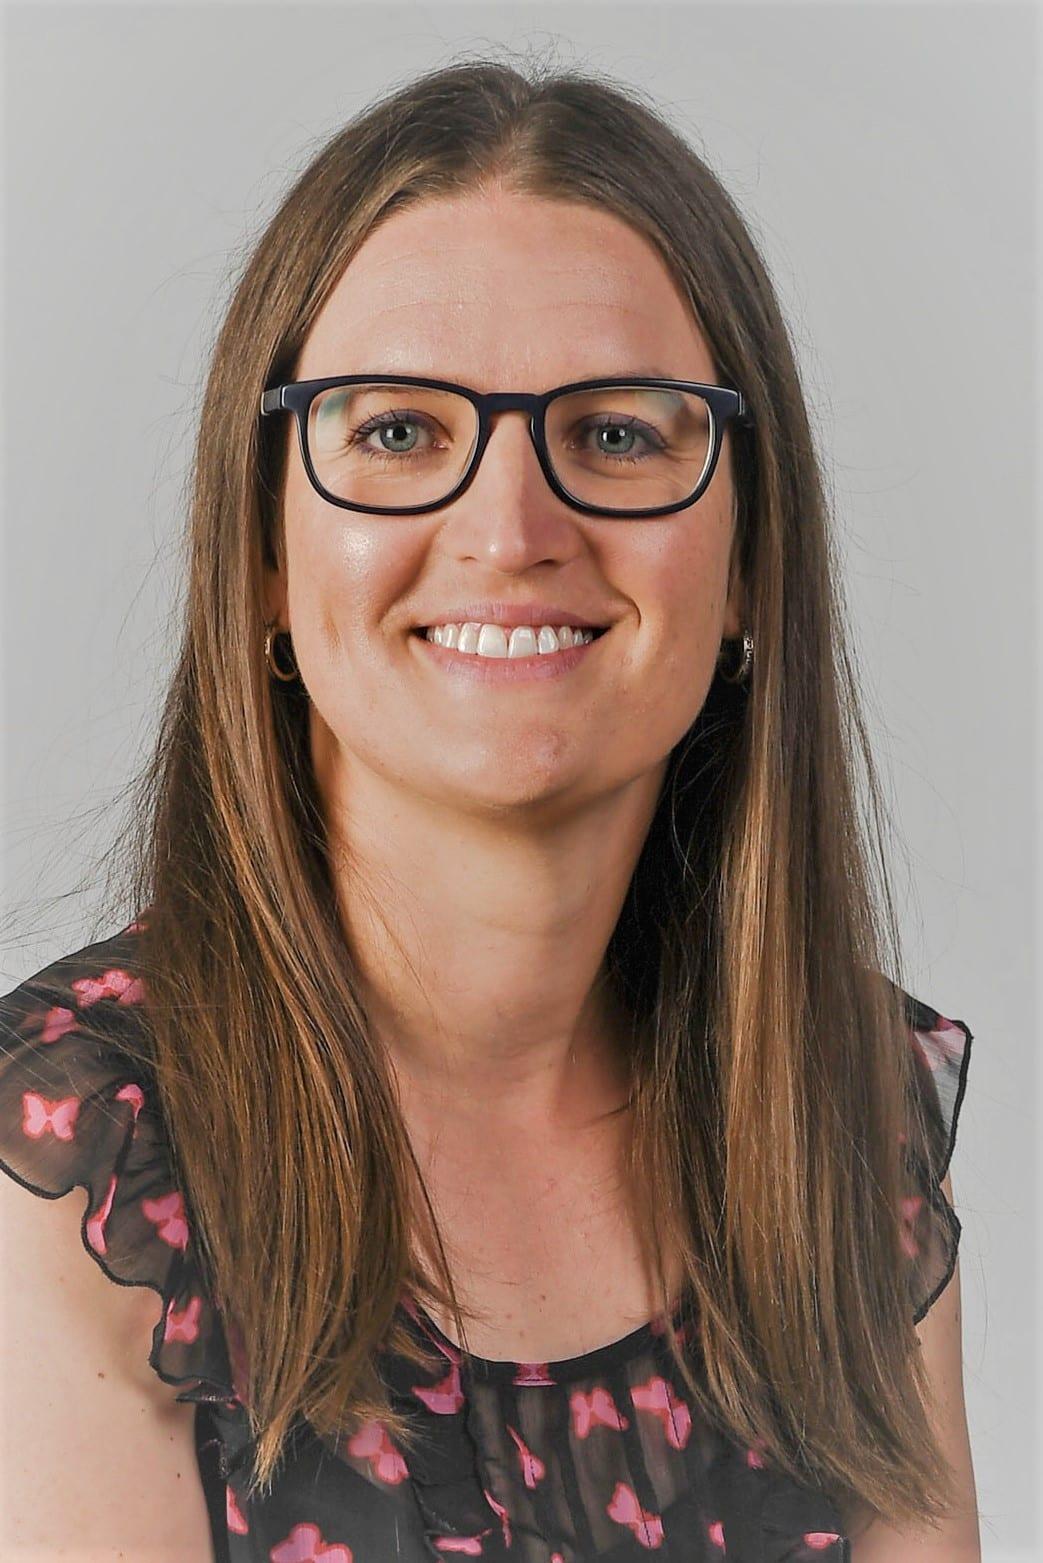 Sallleigh Walters - Media Education portrait - enhanced